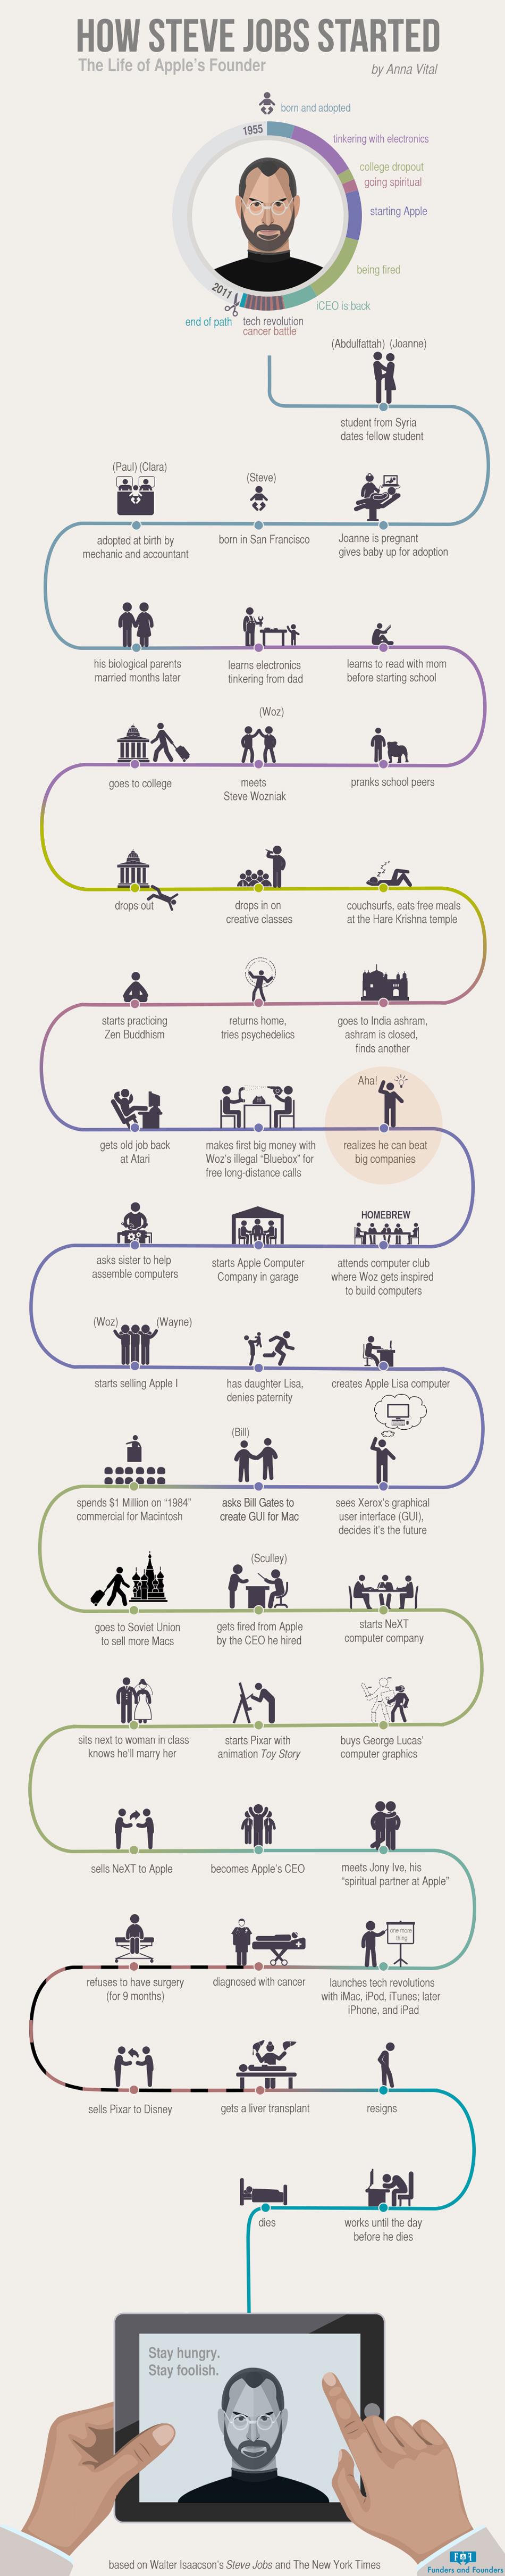 How Steve Jobs Started U2013 The Life Of Visionary Genius [infographic]  Mark Zuckerberg Resume